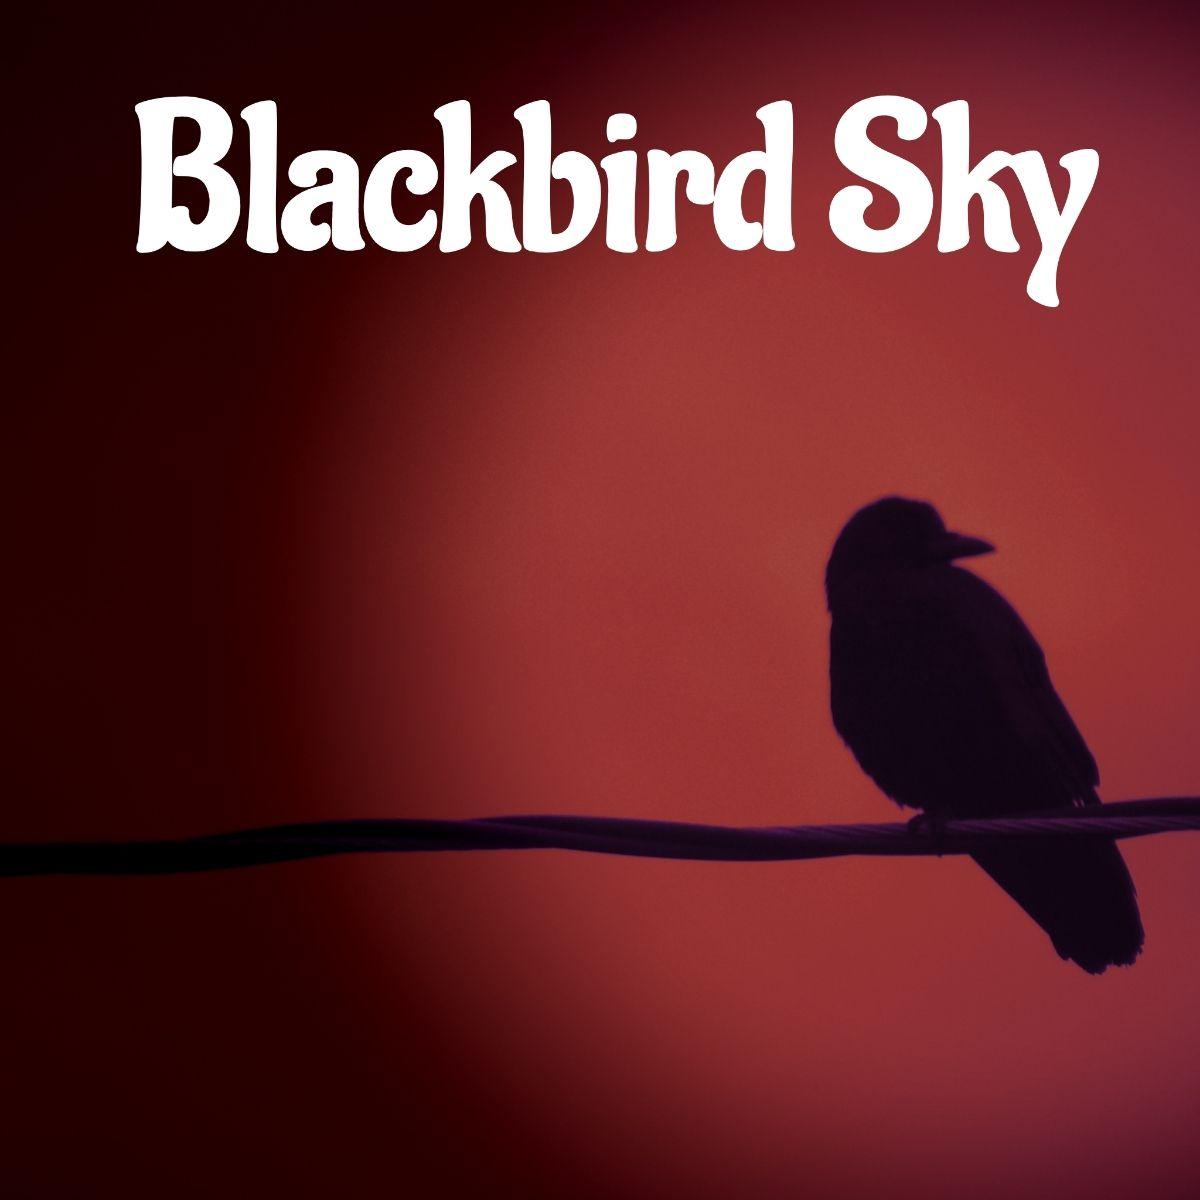 Blackbird Sky